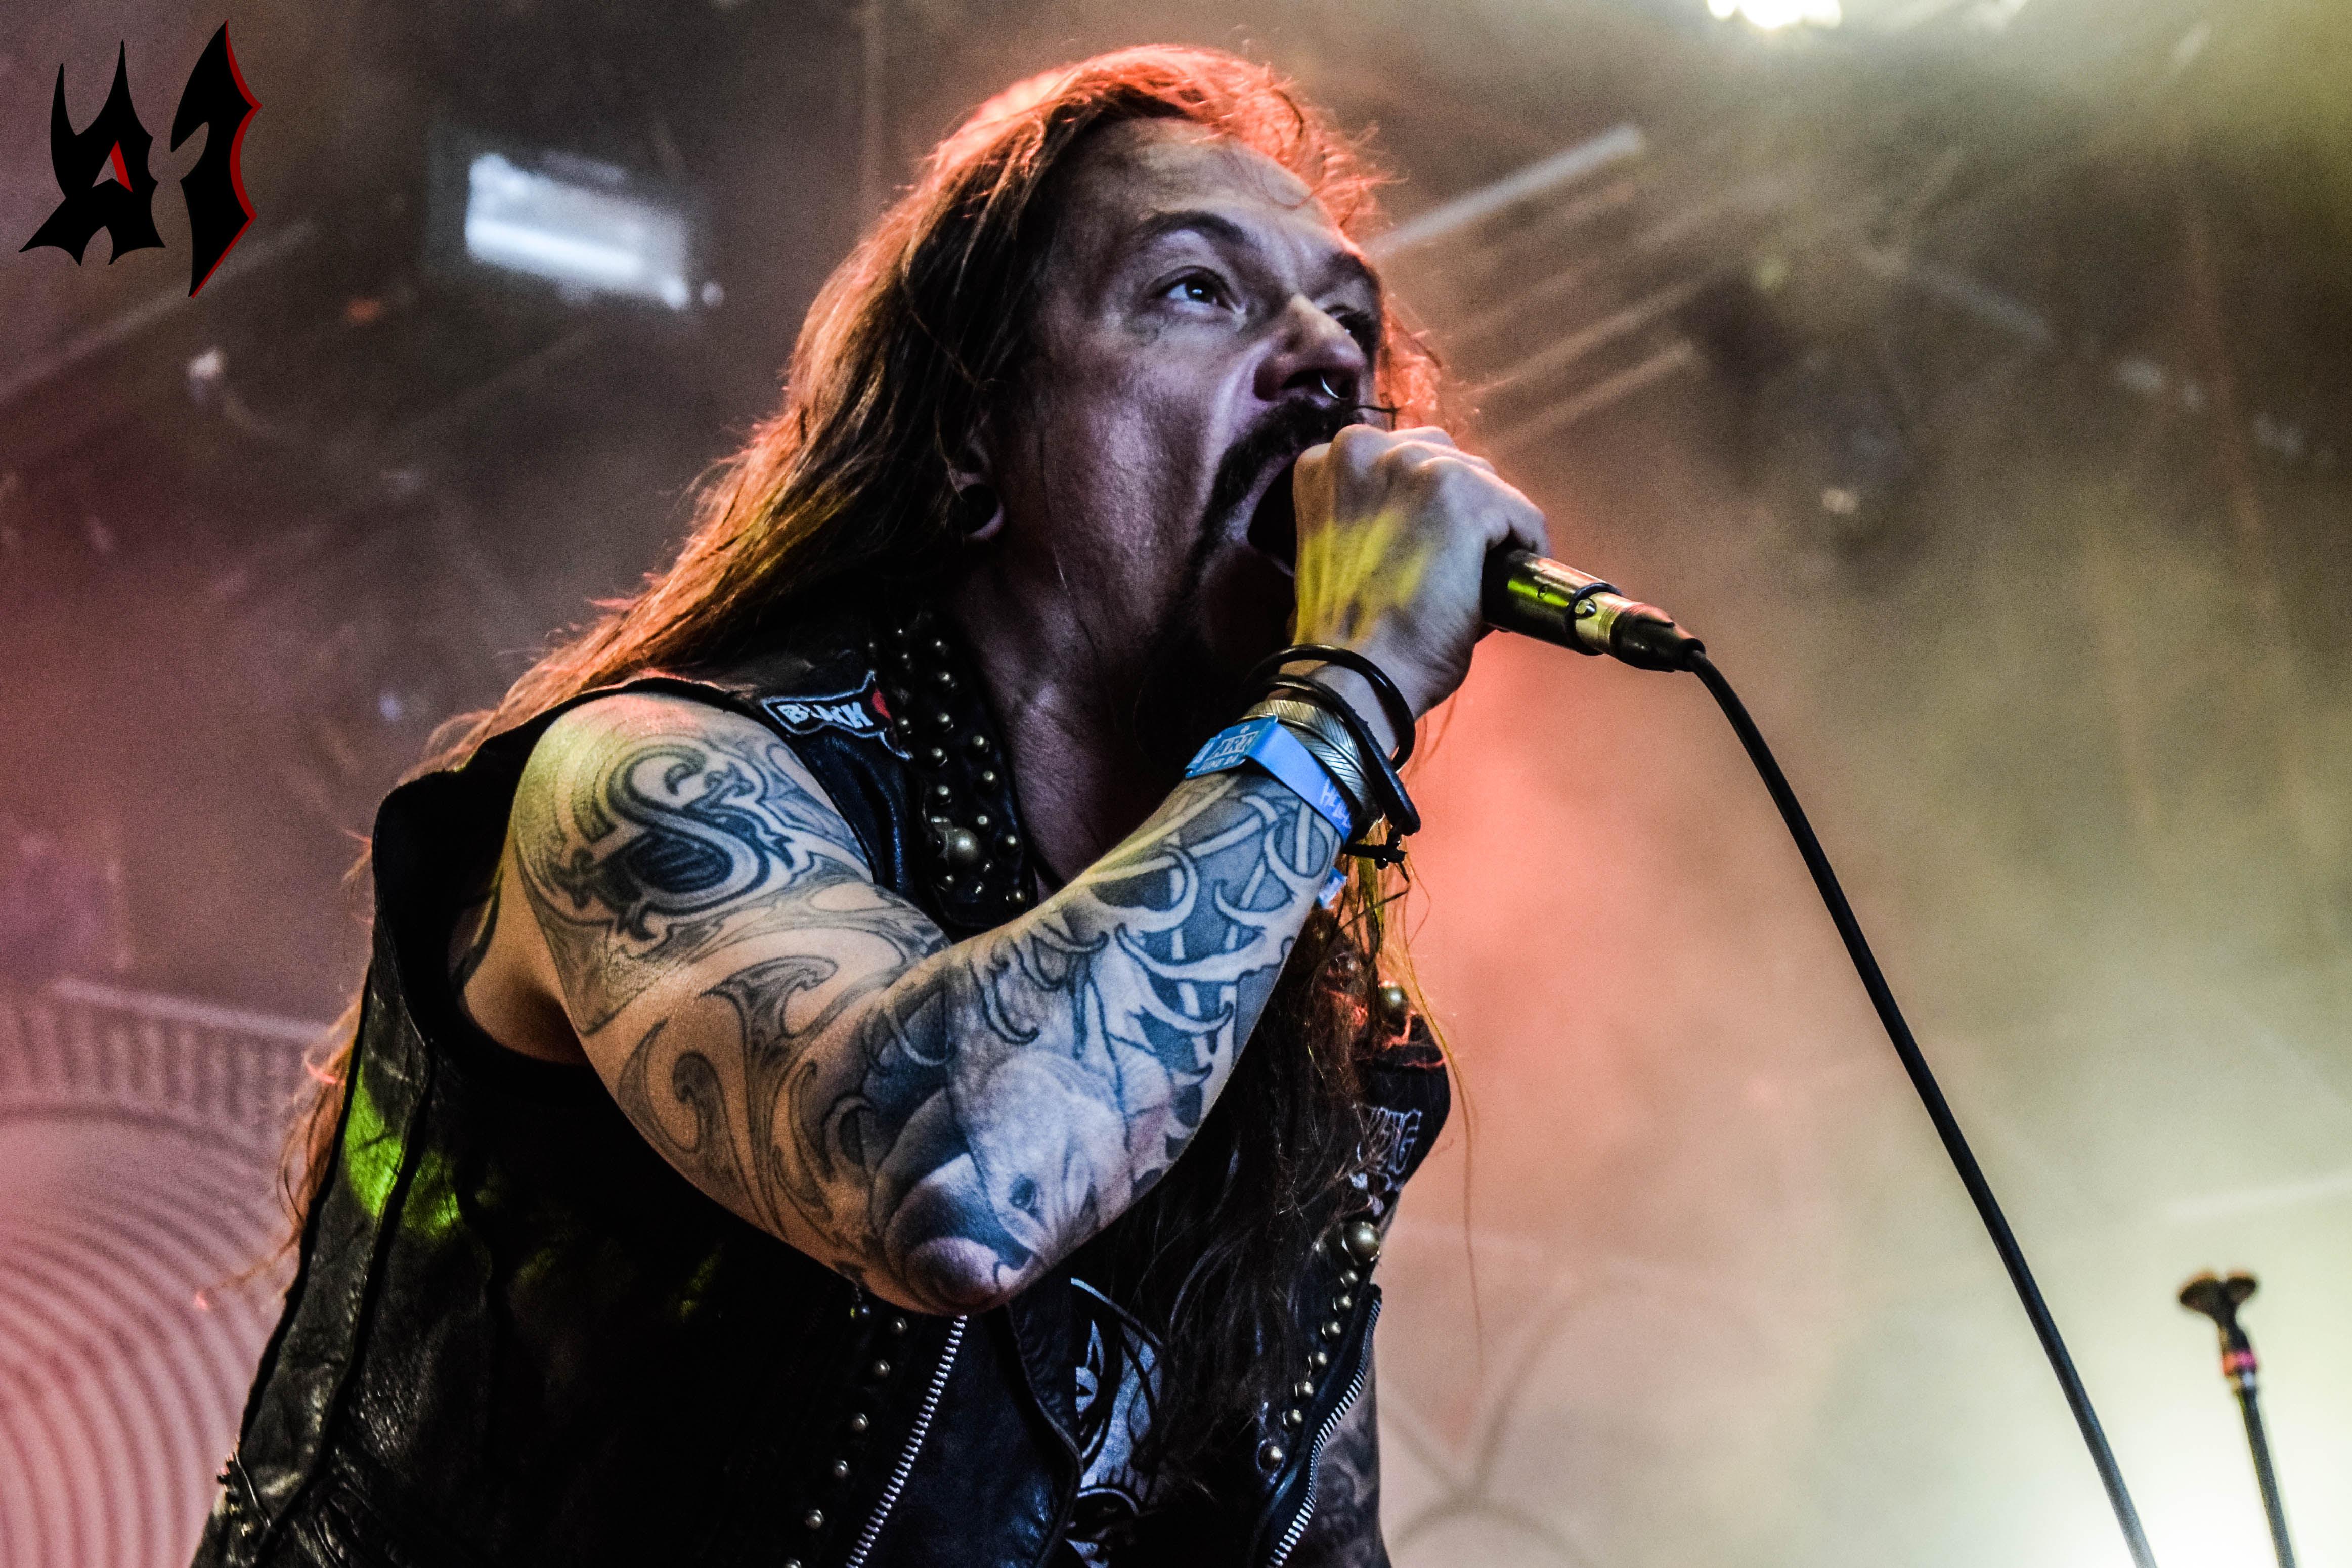 Hellfest 2018 – Day 3 - Amorphis 10